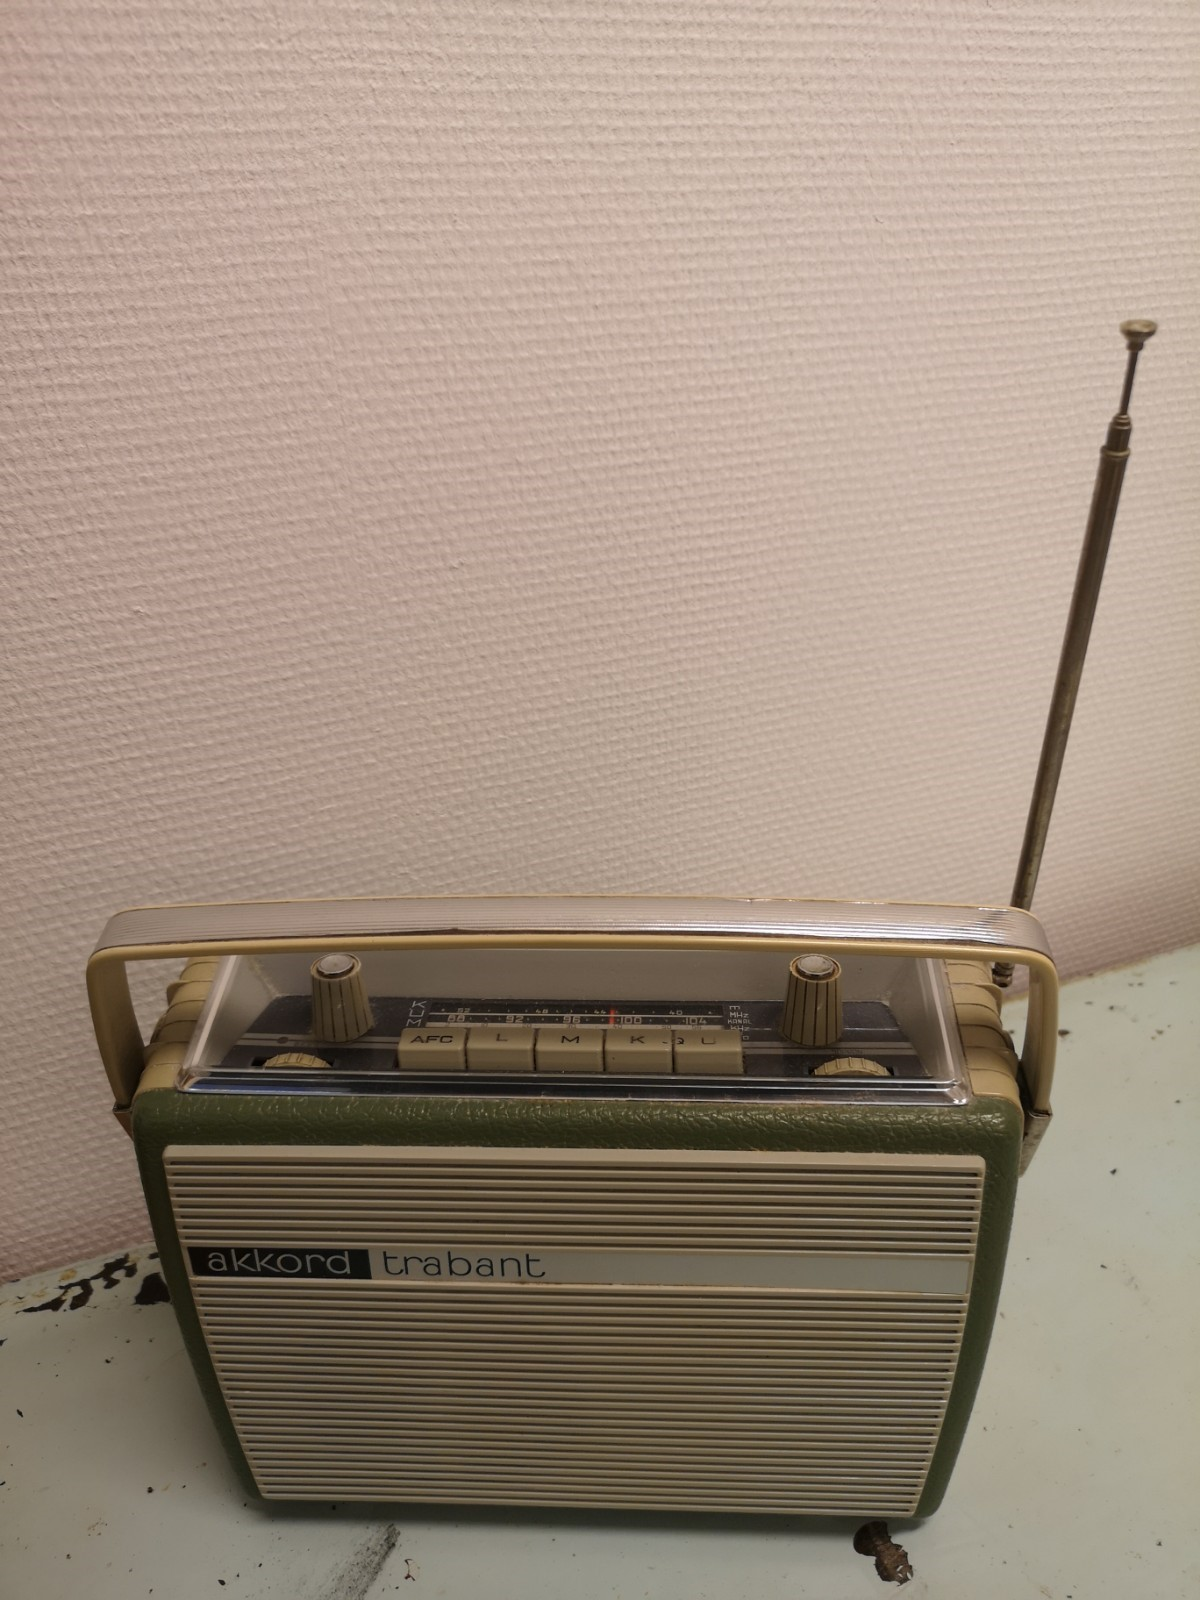 Akkord Trabant matkaradio